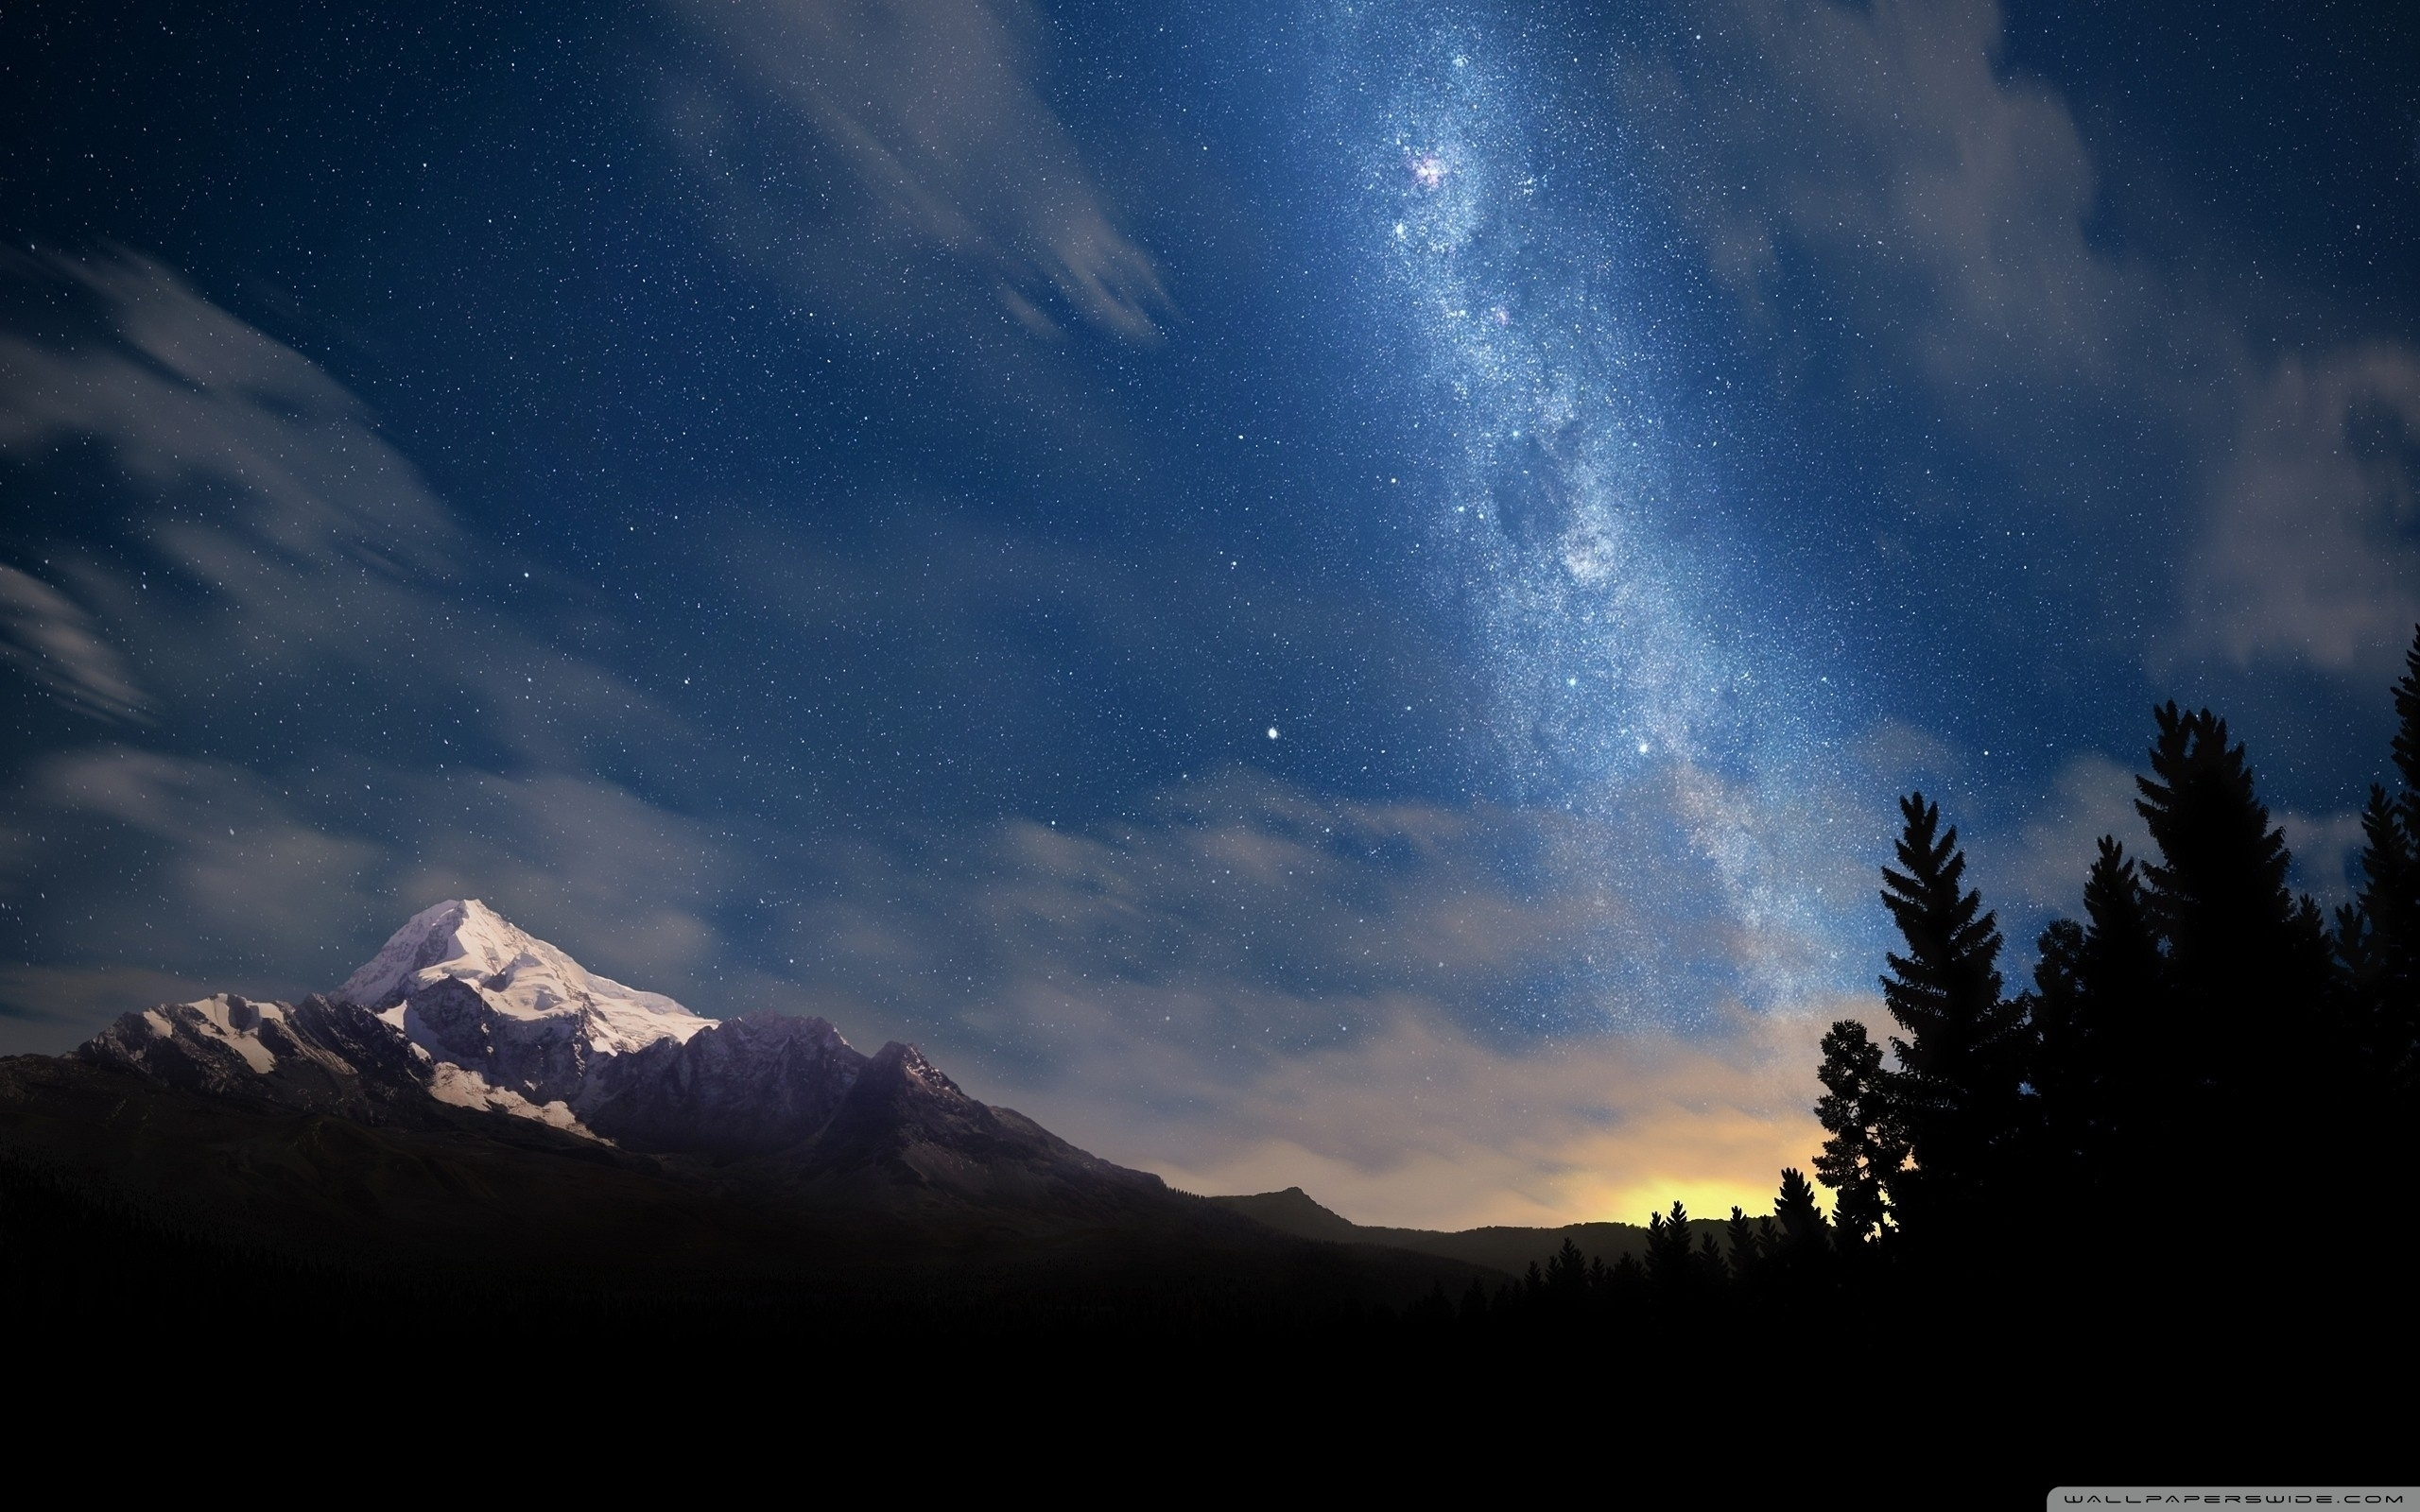 10 Most Popular Starry Night Wallpaper 1920x1080 Full Hd 1080p For